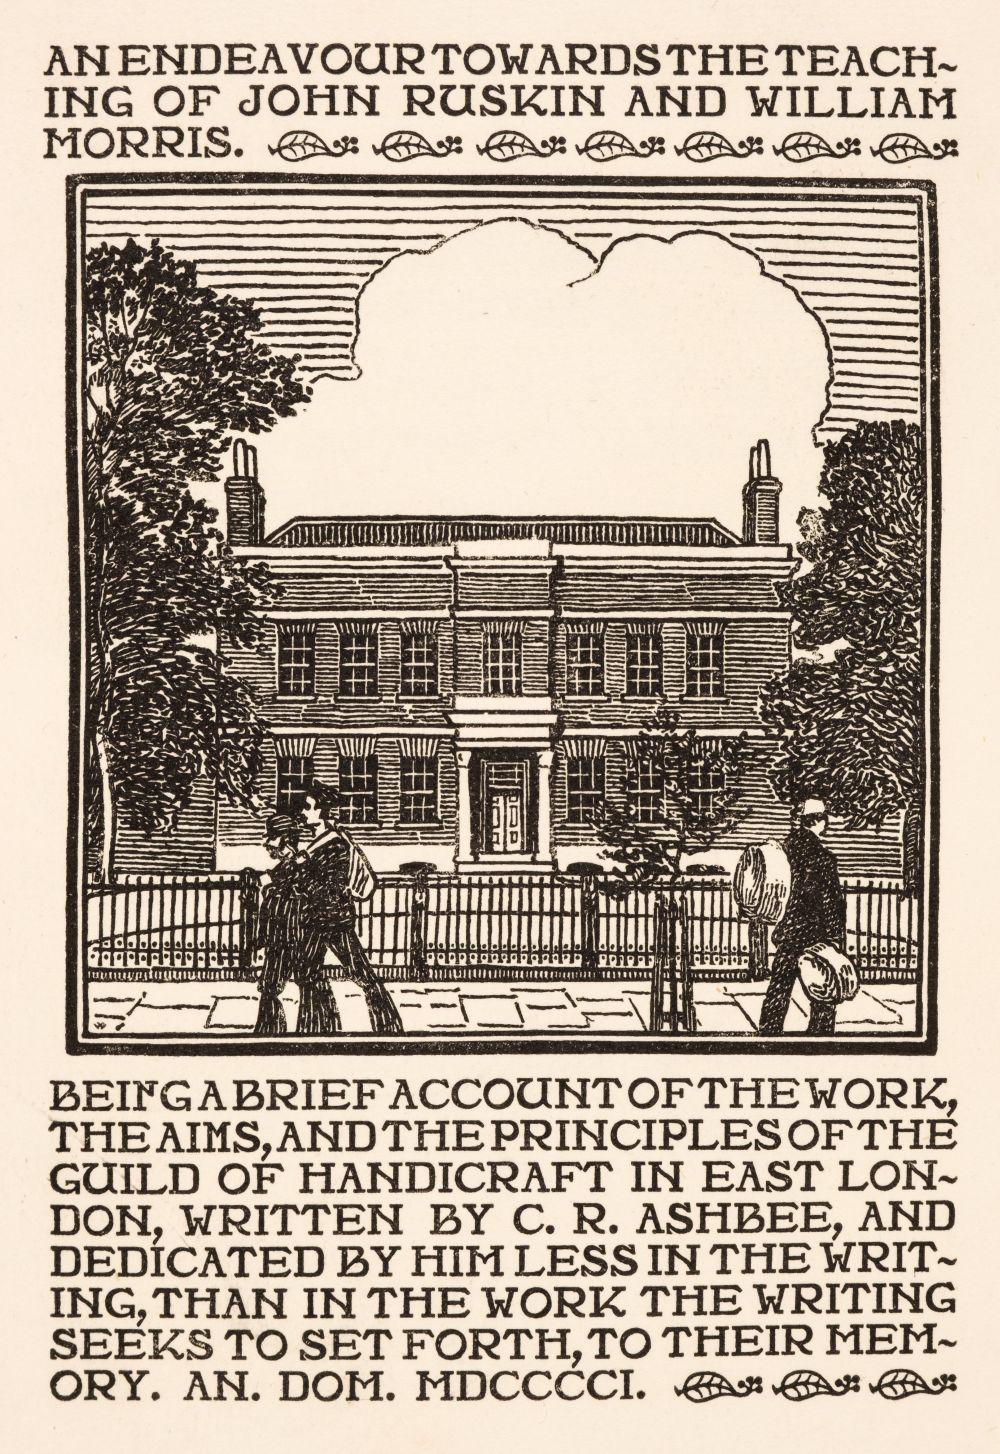 Essex House Press. An Endeavour Towards the Teaching of John Ruskin, 1901